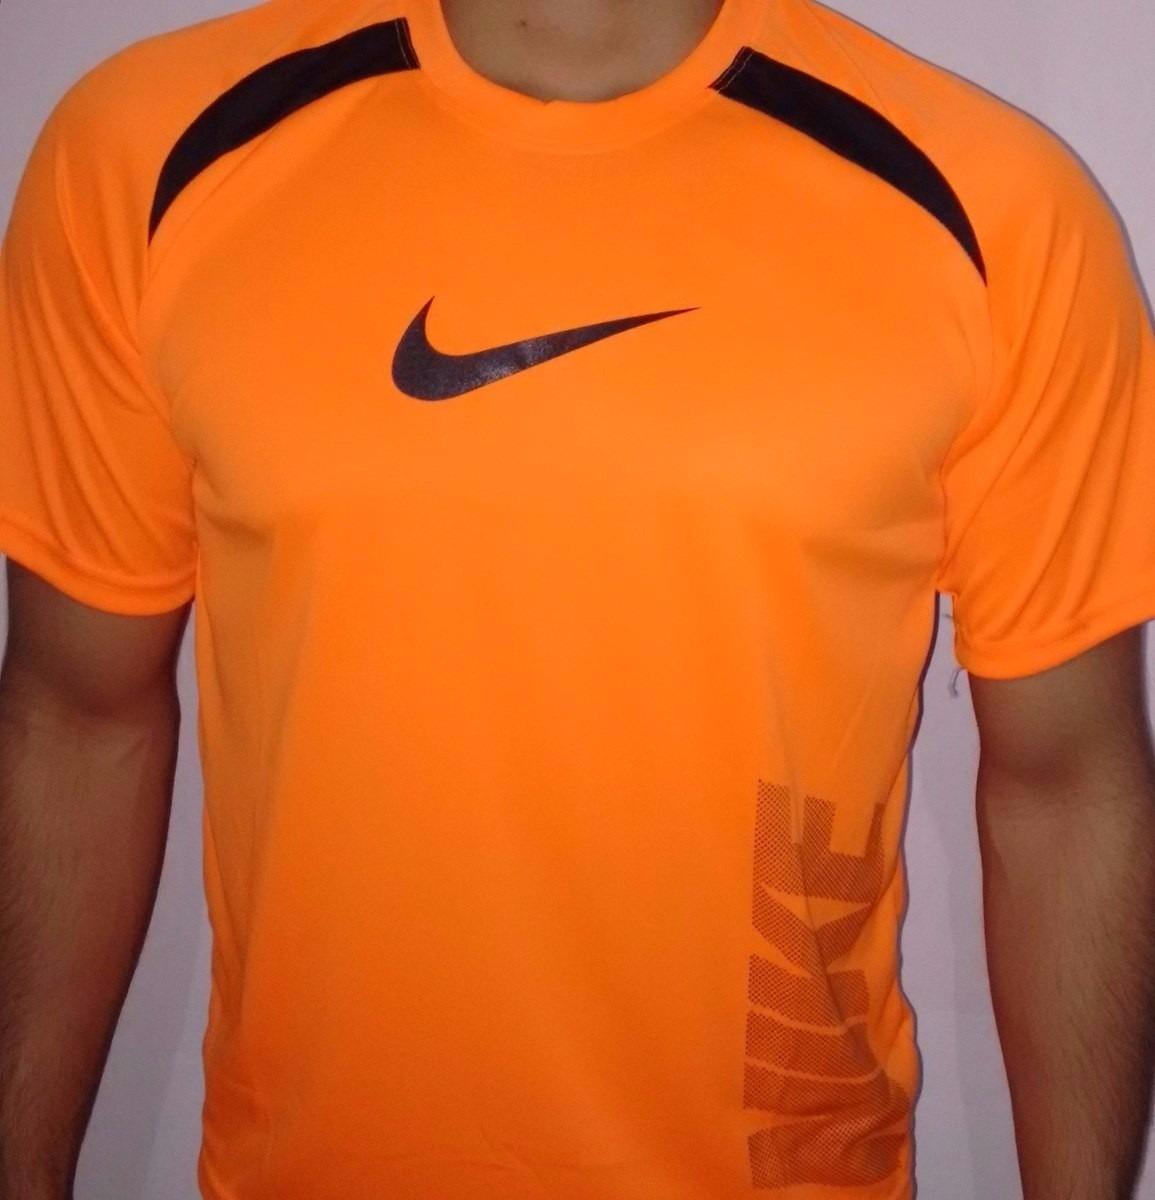 camisetas kit c  10 camisas dry fit nike academia atacado. Carregando zoom. 1a26c206ae2d4